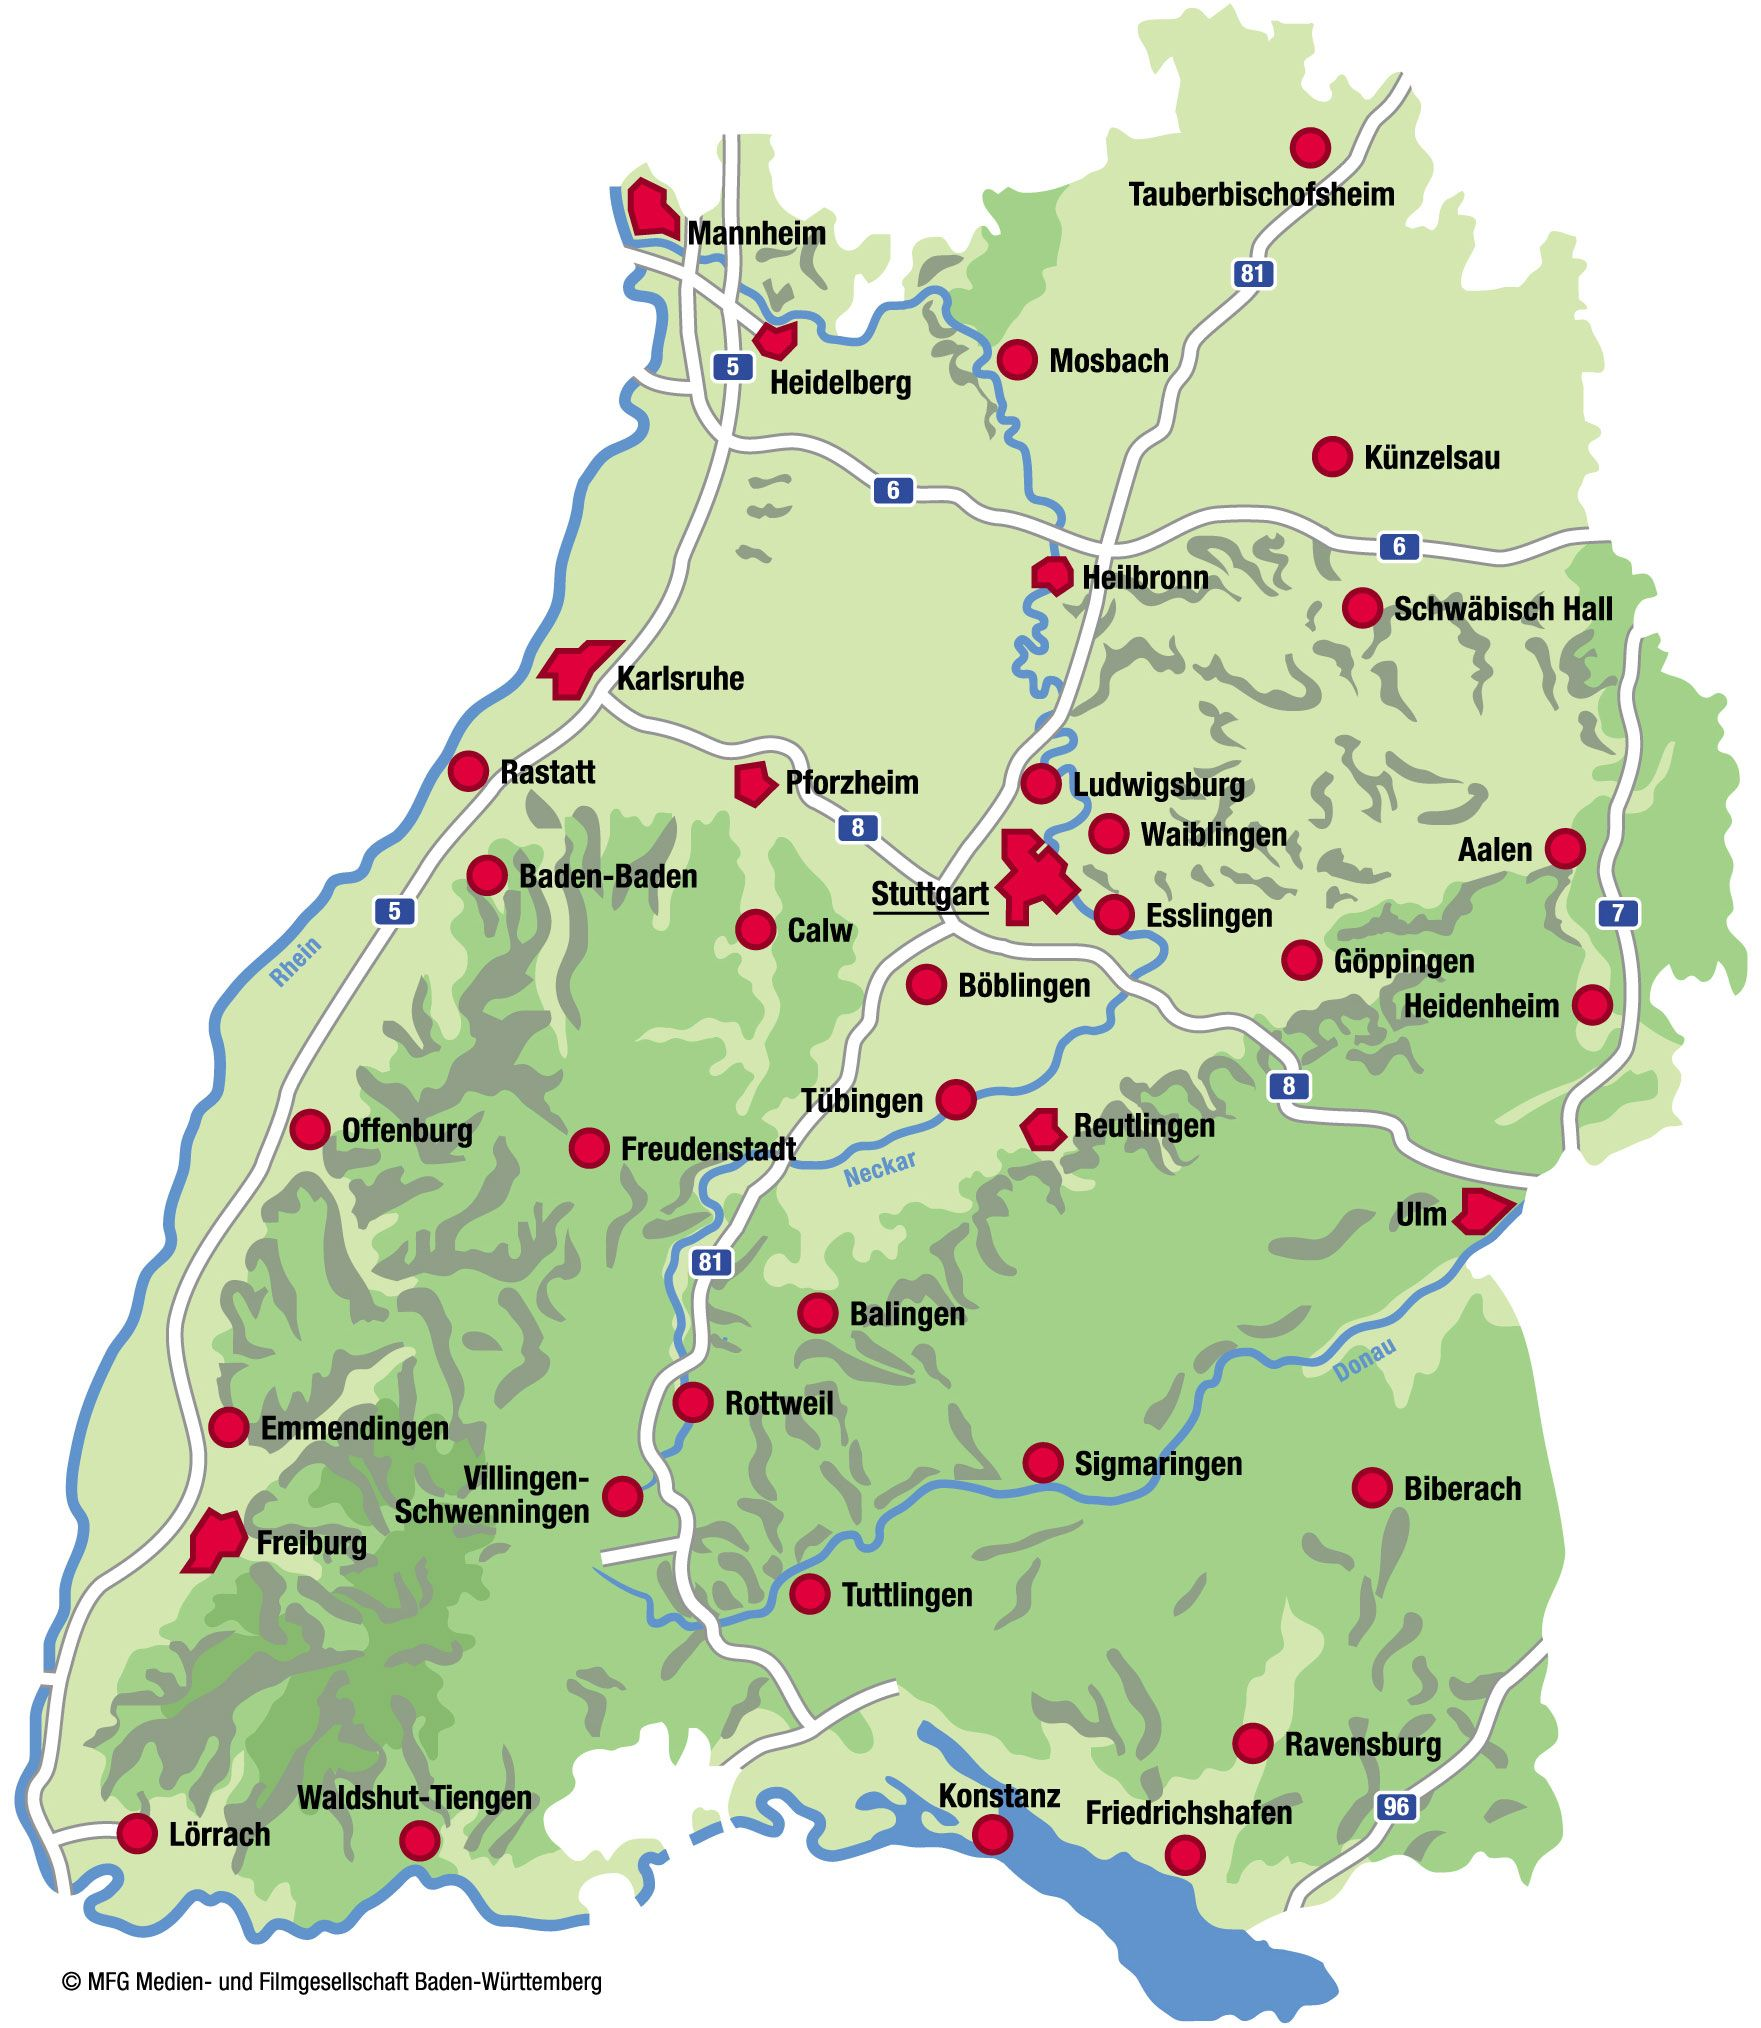 Black Forest Map Germany Pinterest Black Forest - Germany map black forest